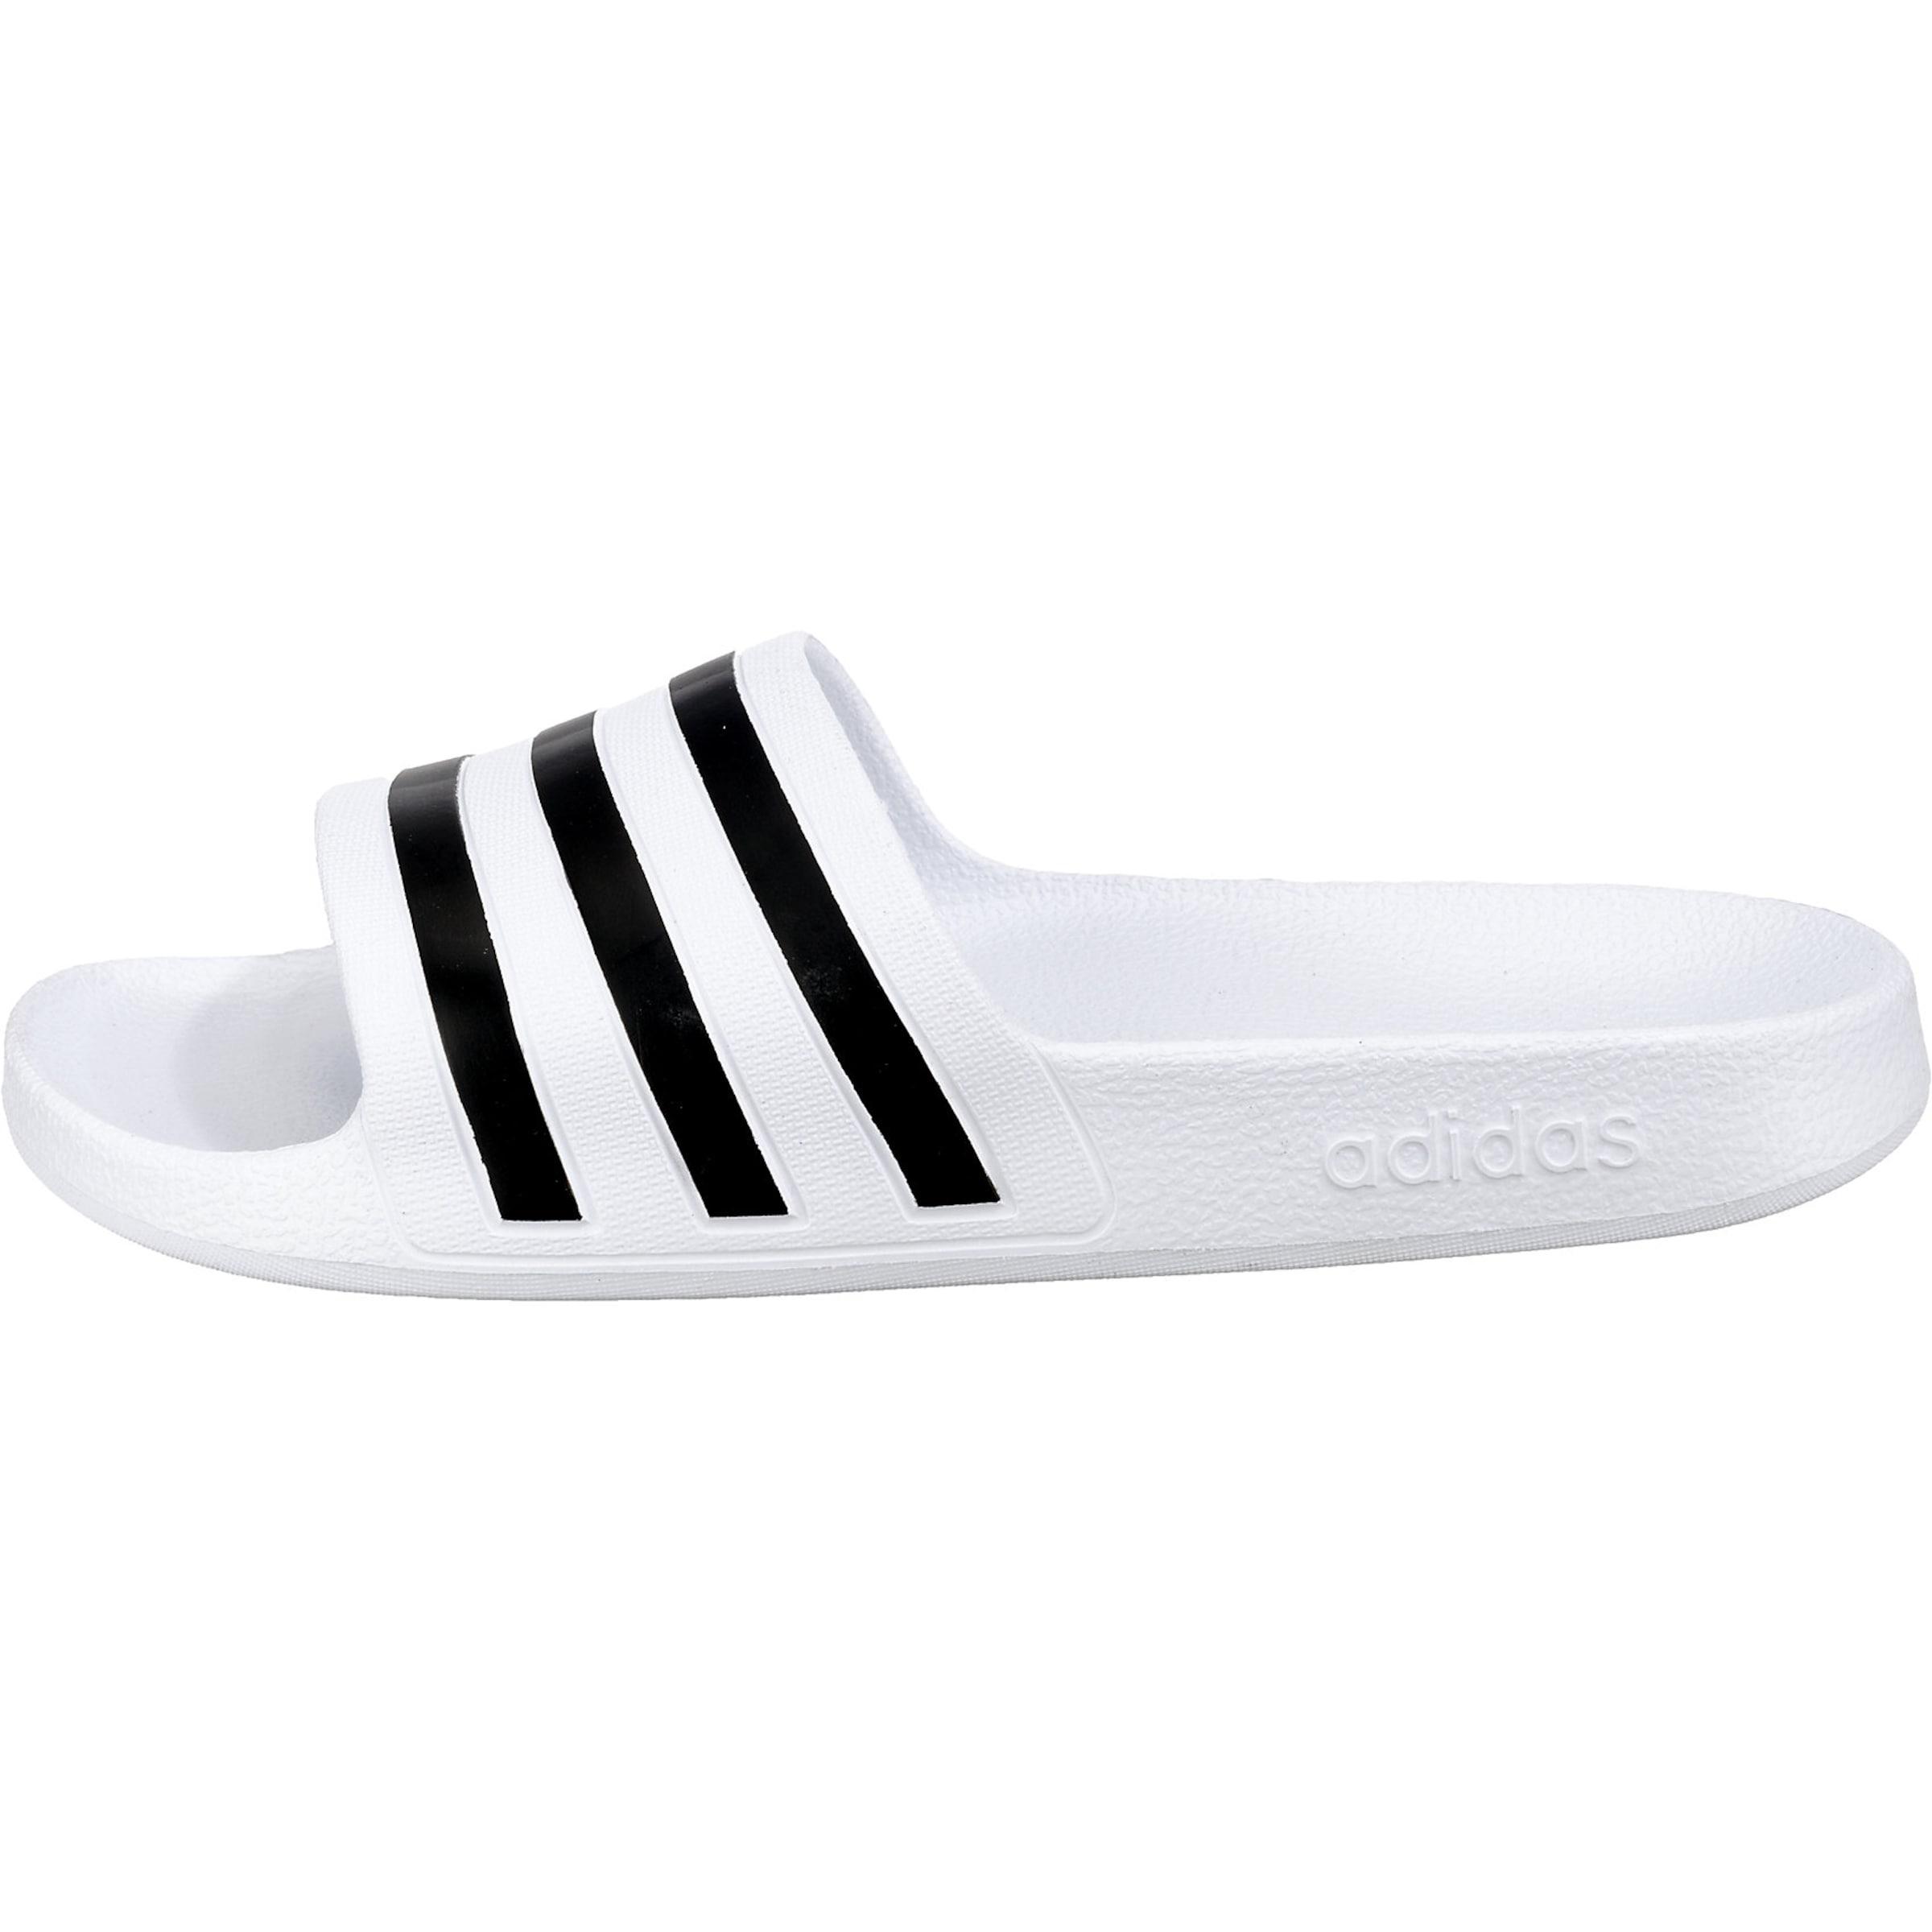 ClaquettesTongs Noir Blanc Adidas Performance En 'adilette Aqua' wOkXTPZiu